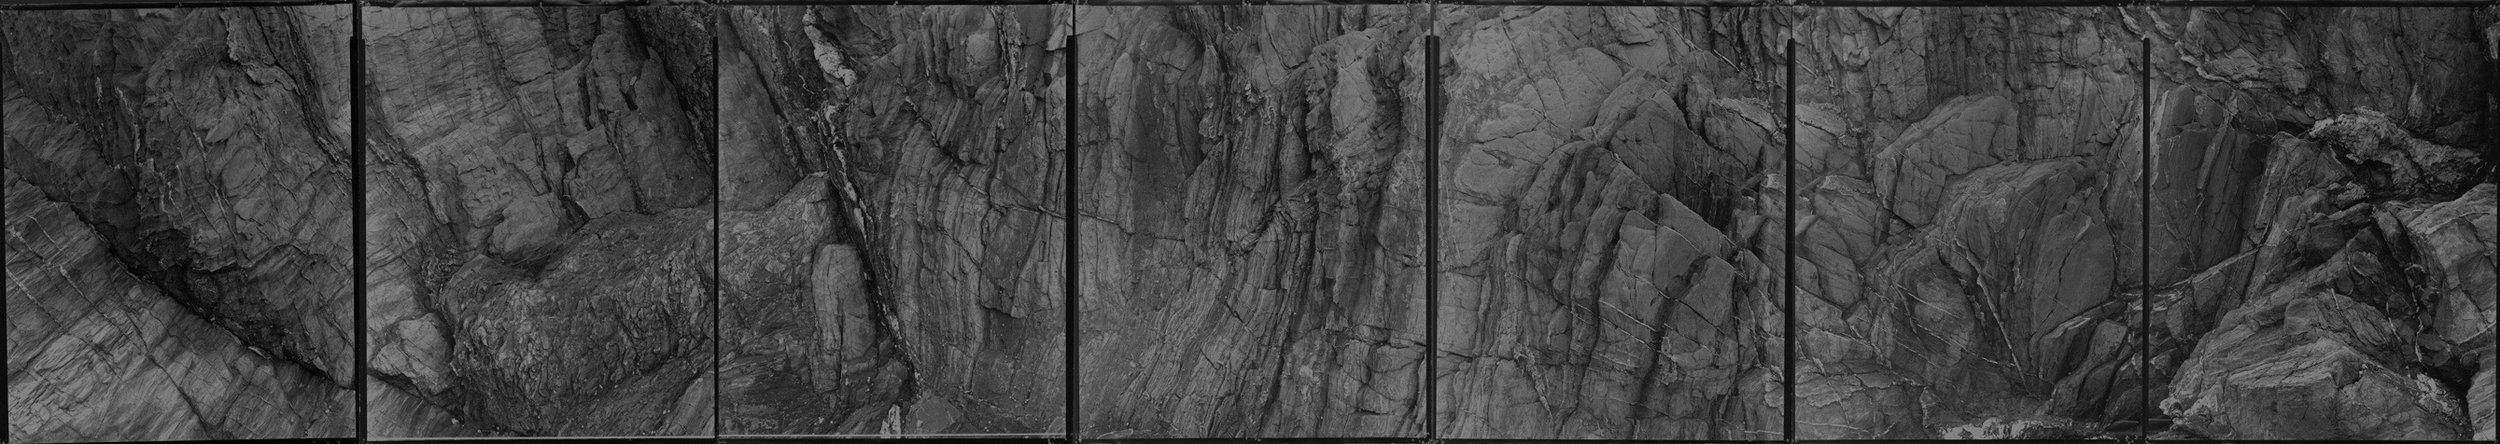 Untitled 7 panel piece ( 5-28-02-9 ), 2002